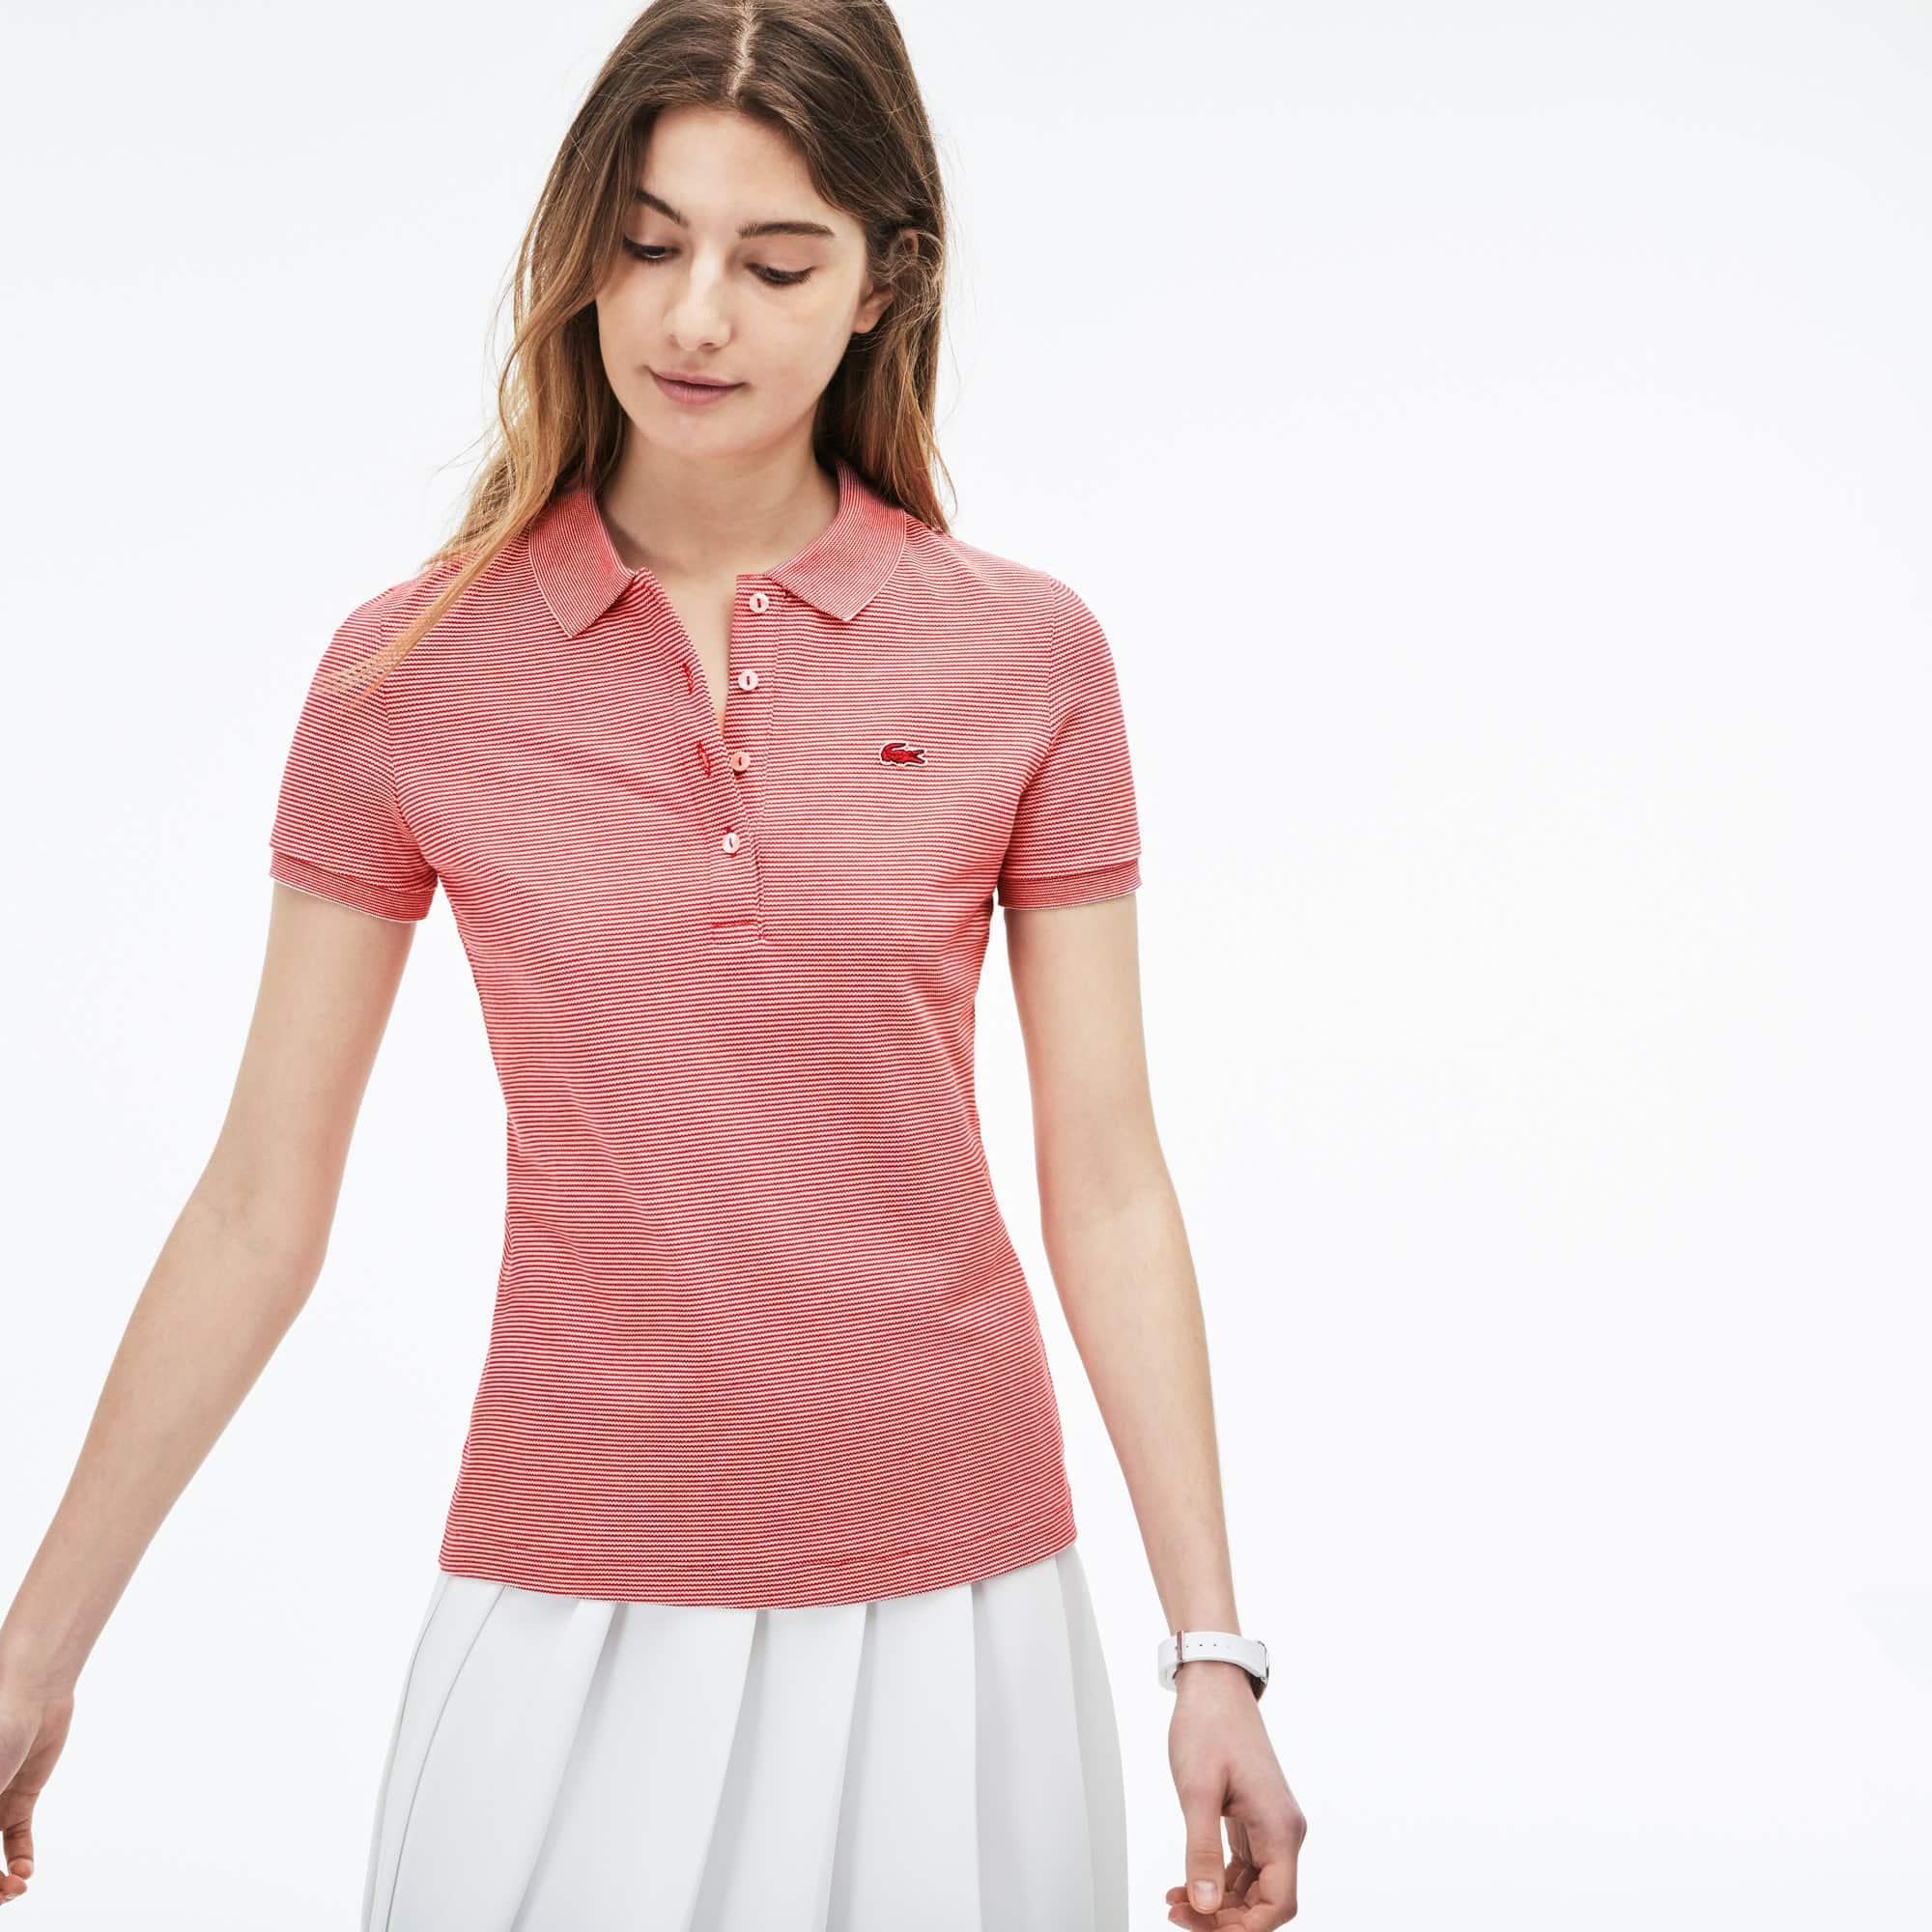 Camisas polo   Feminino   Sale Lacoste 455b39b5f9